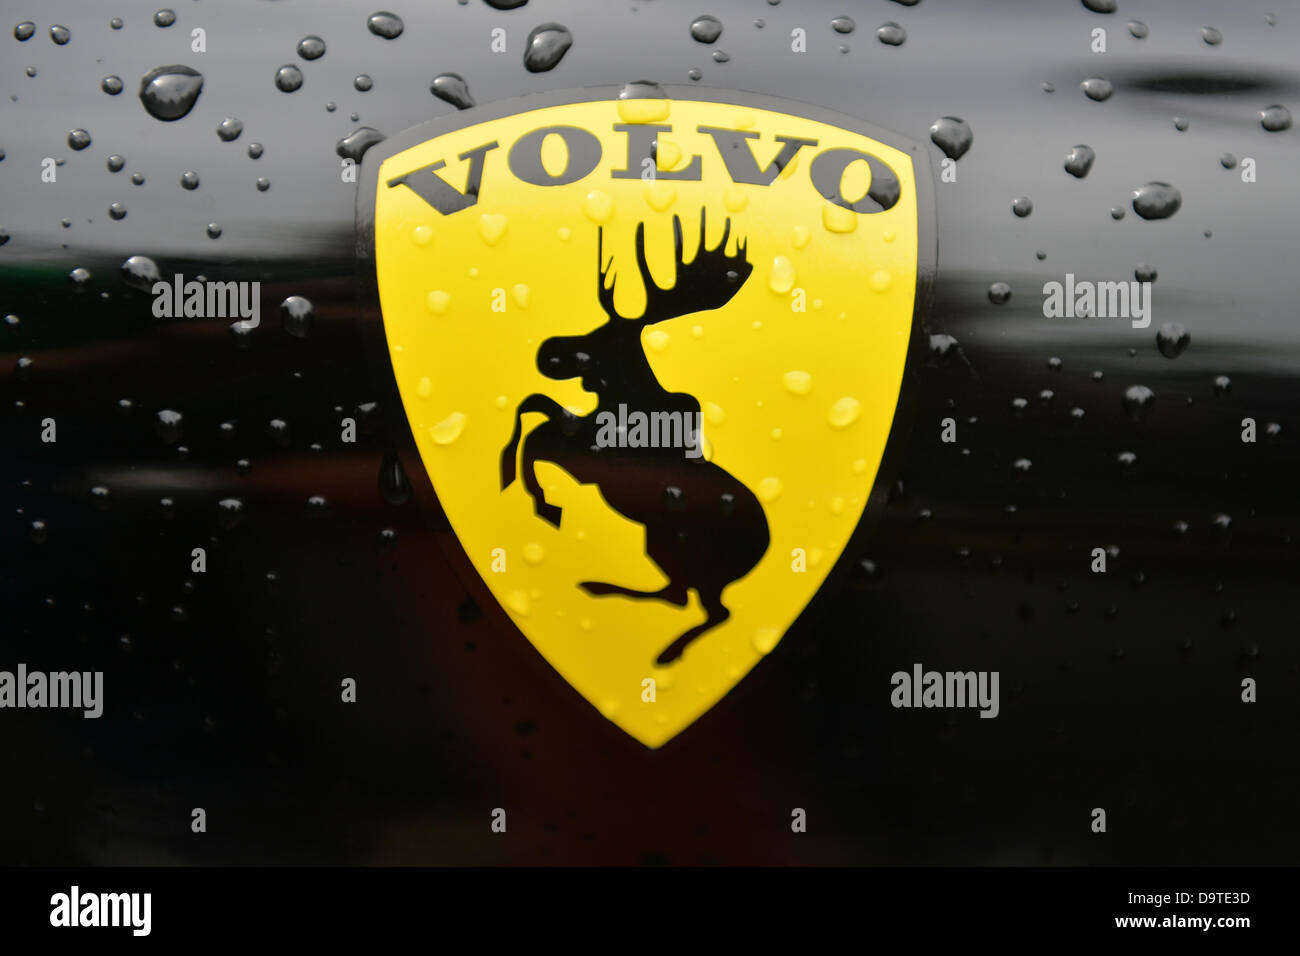 All Cars Symbols Wallpaper The Logo Sticker Of Swedish Car Manufacturer Volvo